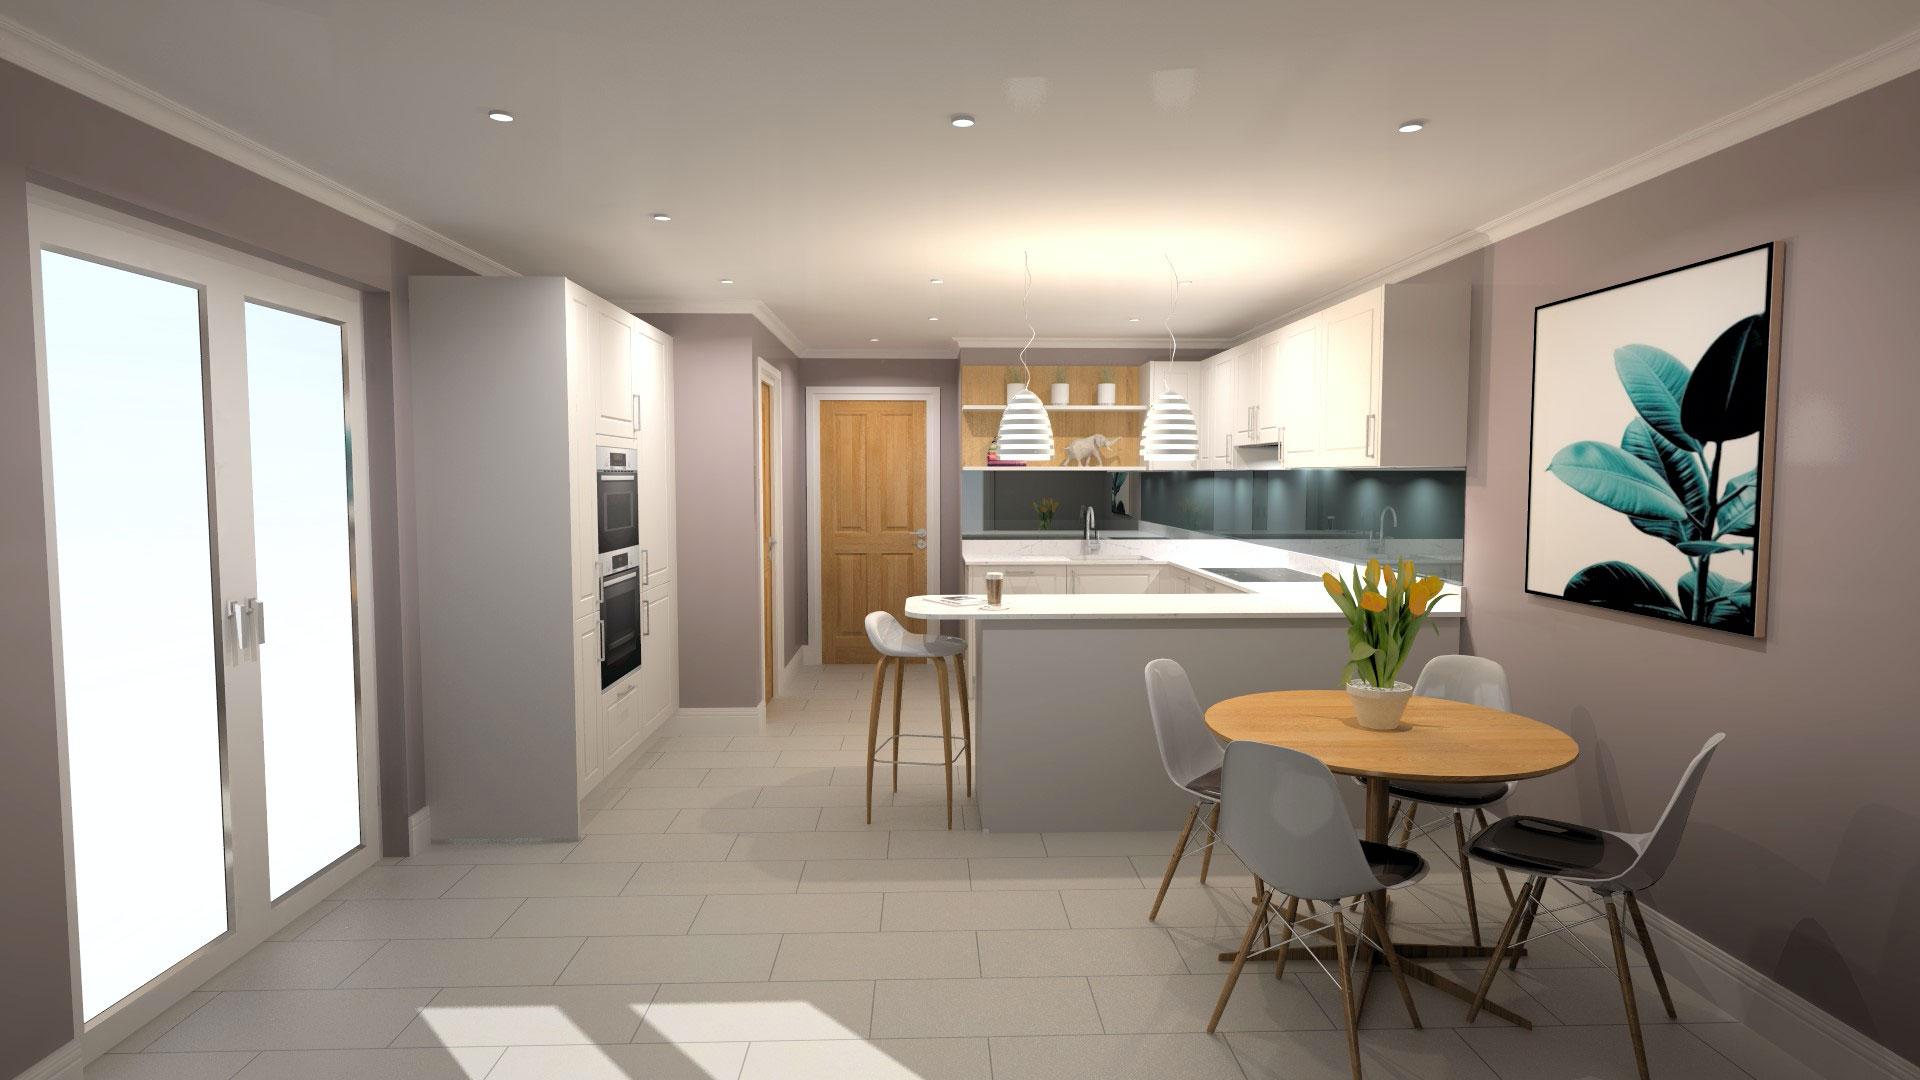 Amberstone Developments Sandgate house kitchen 3